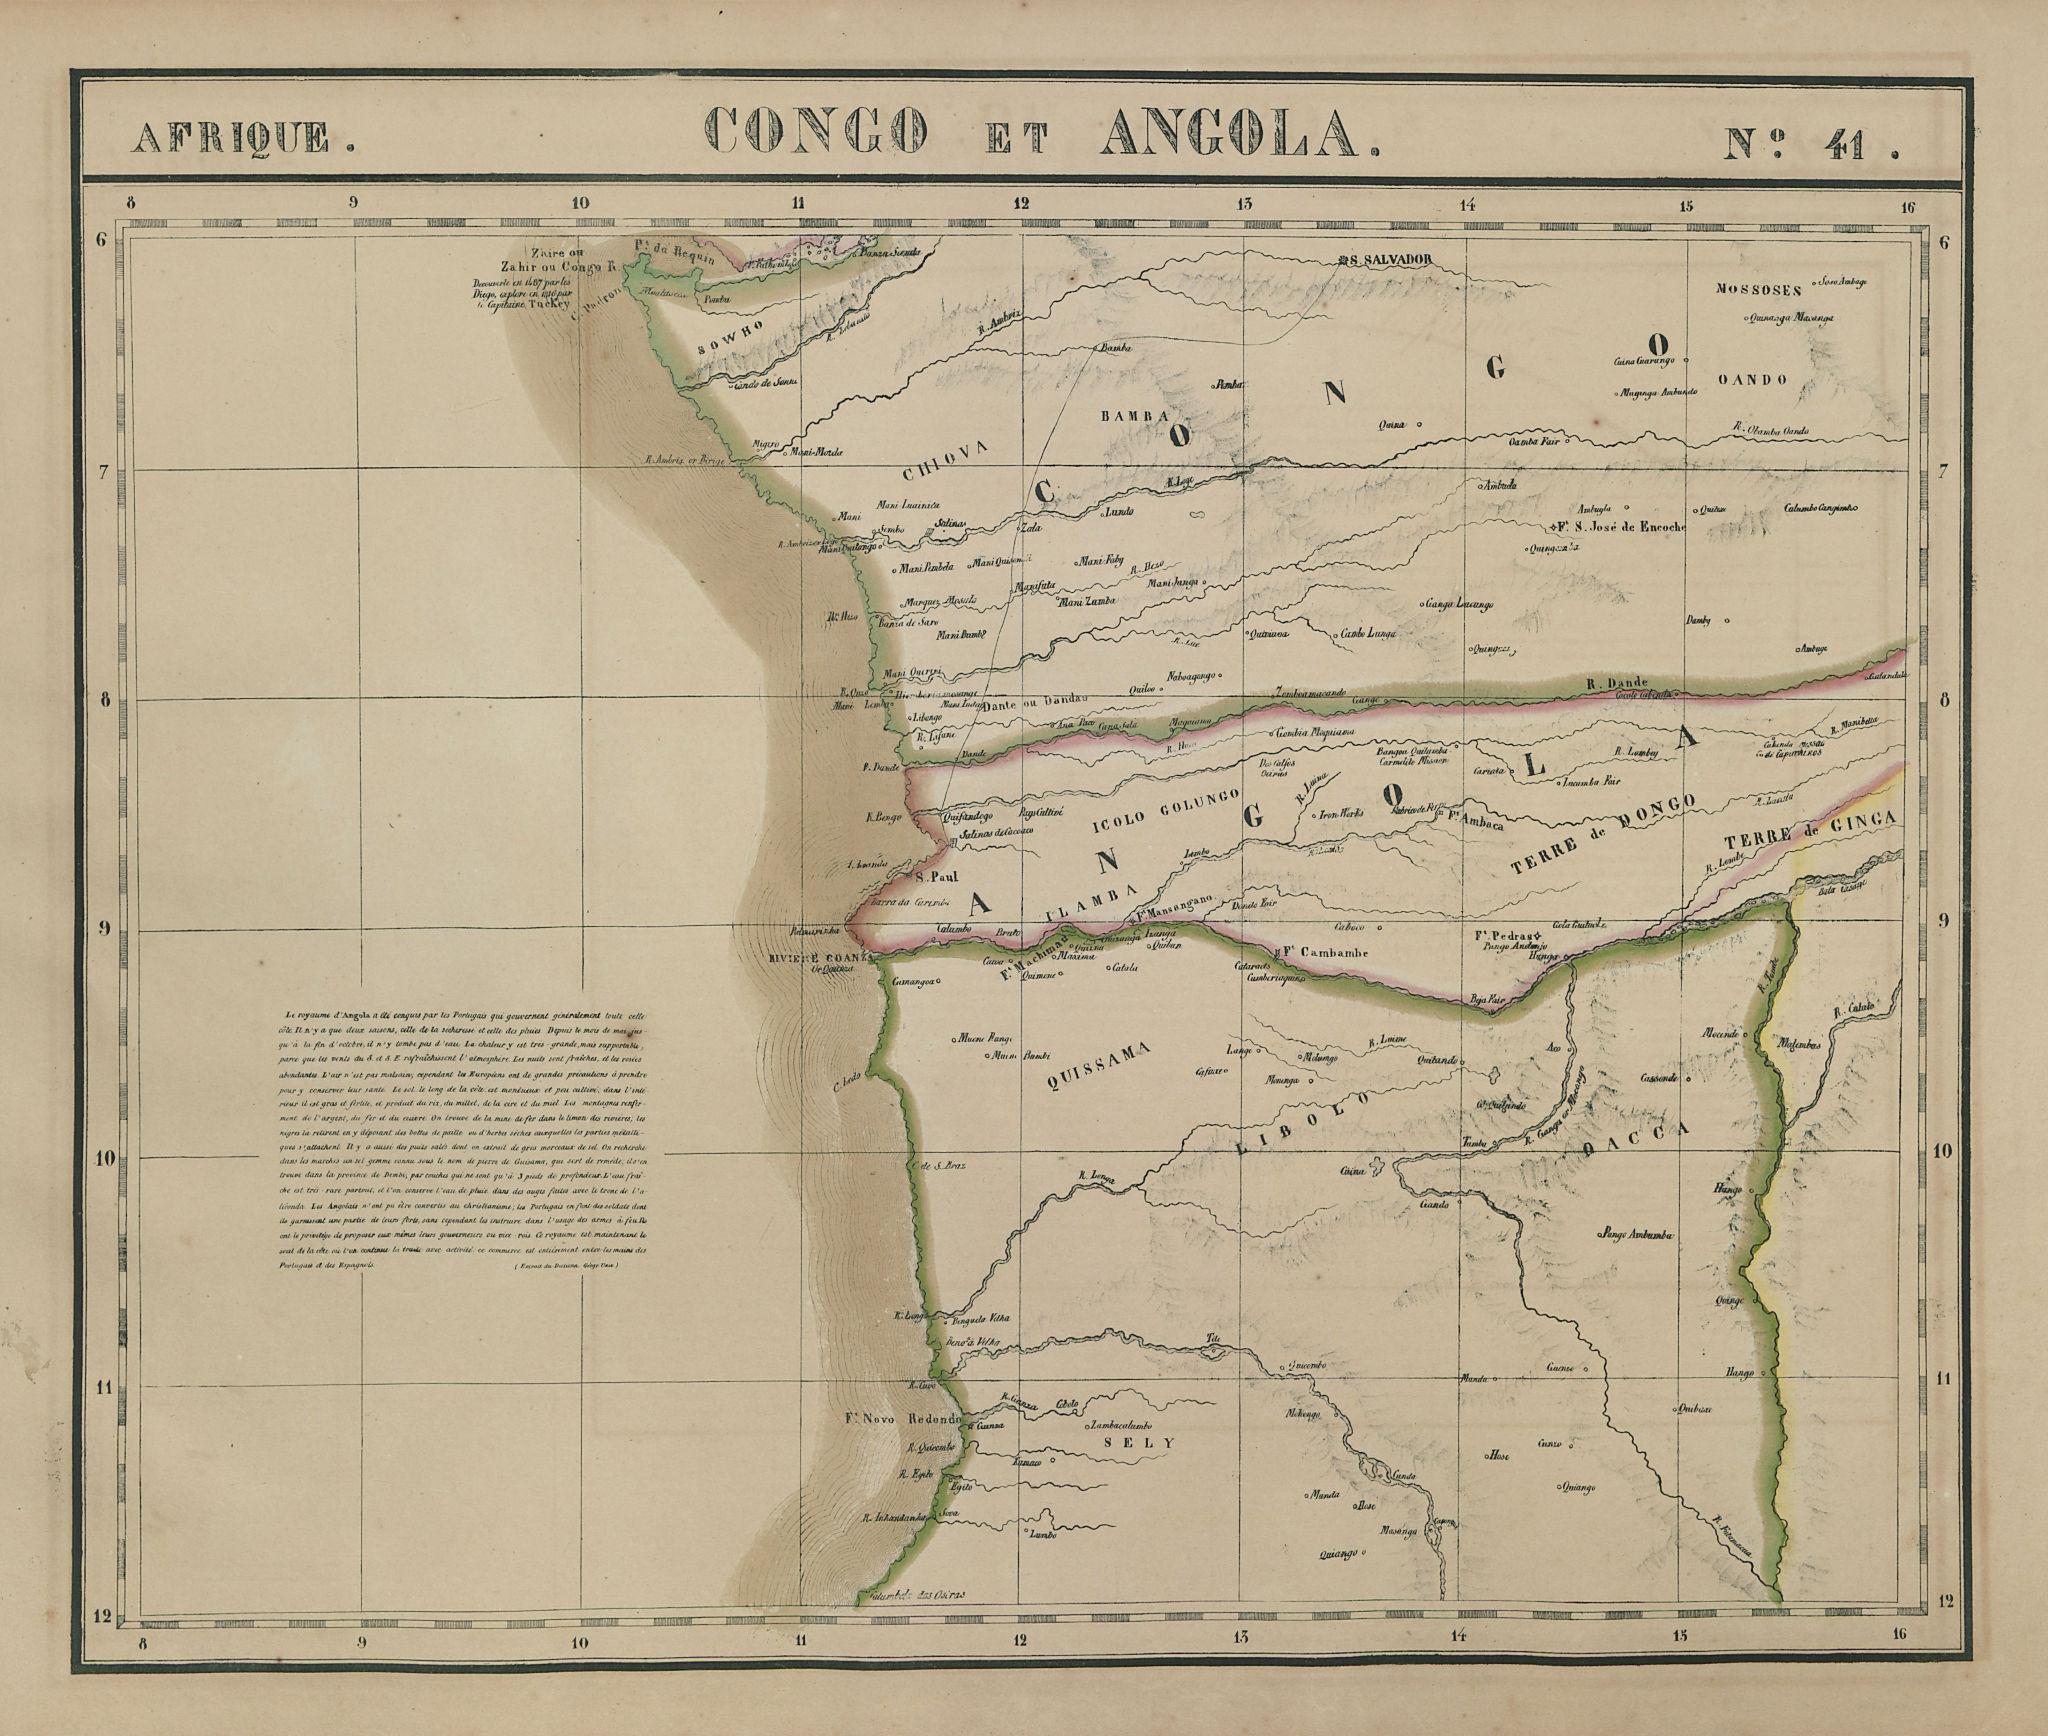 Afrique. Congo et Angola #41. Northern Angola. VANDERMAELEN 1827 old map